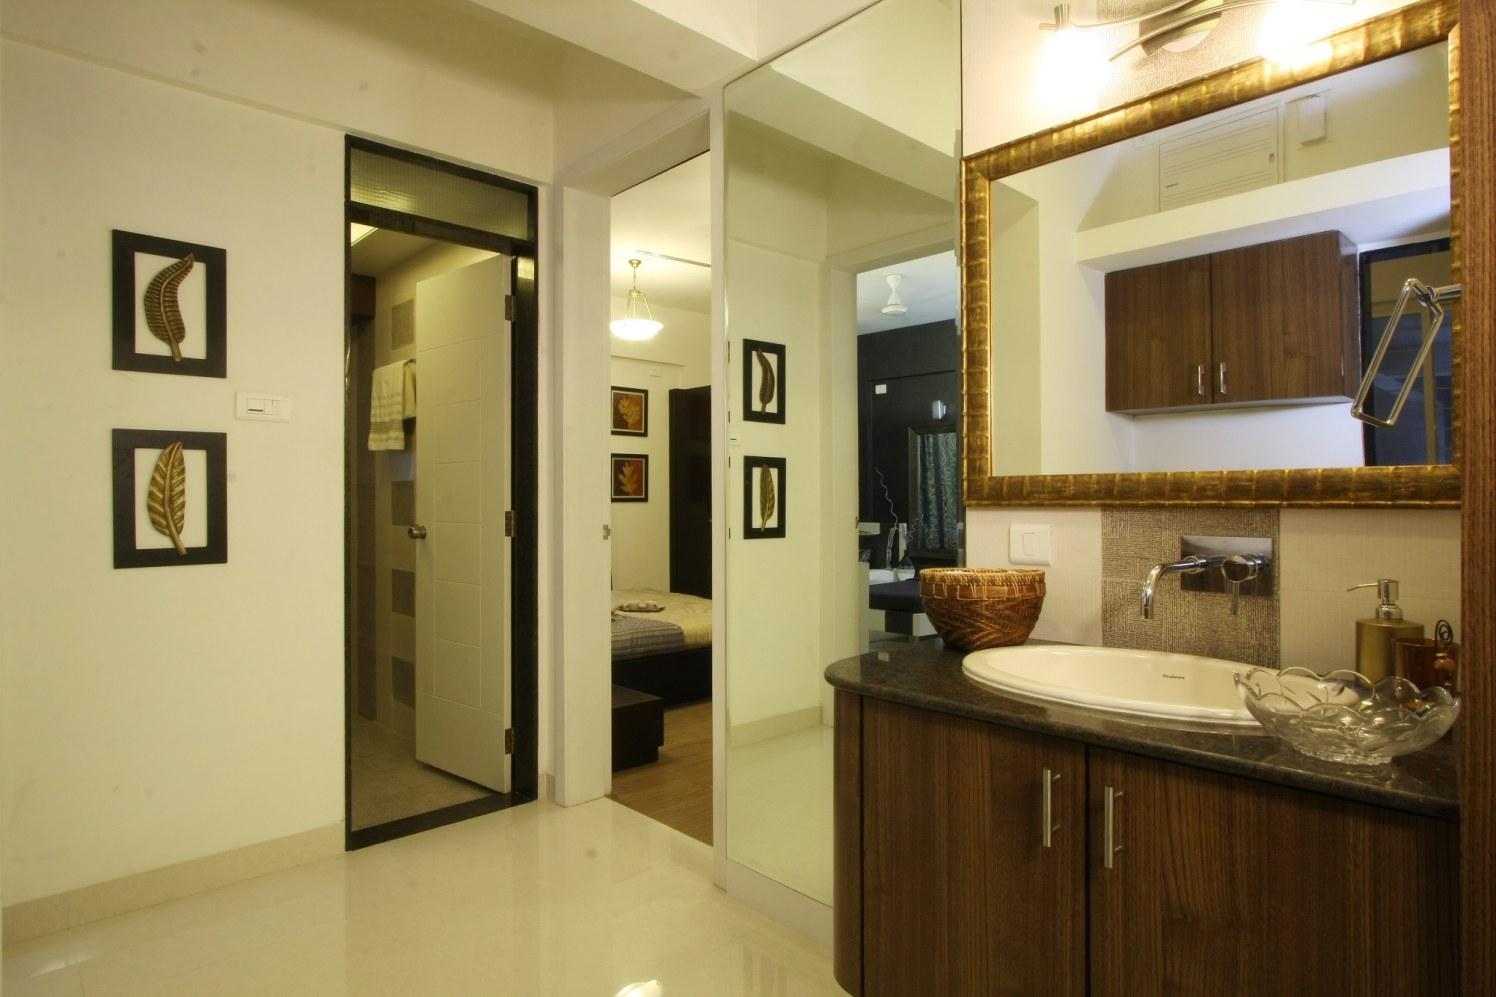 Clean Bathroom Good Living by Harshila Shreeram Talasila Modern | Interior Design Photos & Ideas